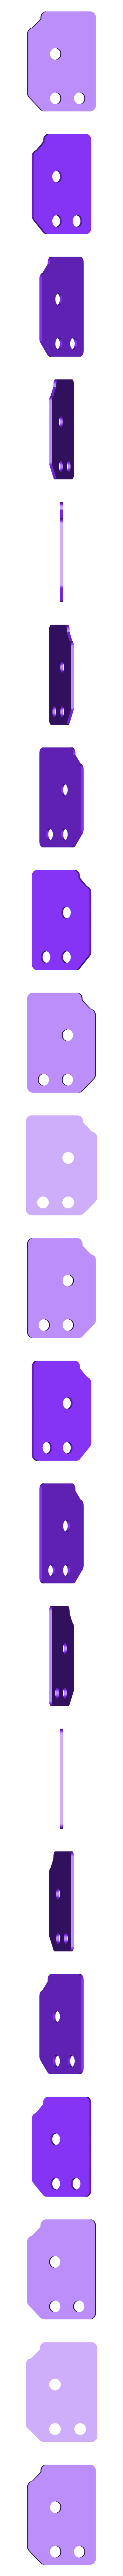 patch3 (1pcs).STL Download STL file Folding Quadcopter 450 Frame • 3D print object, AleksandrDolzhenko